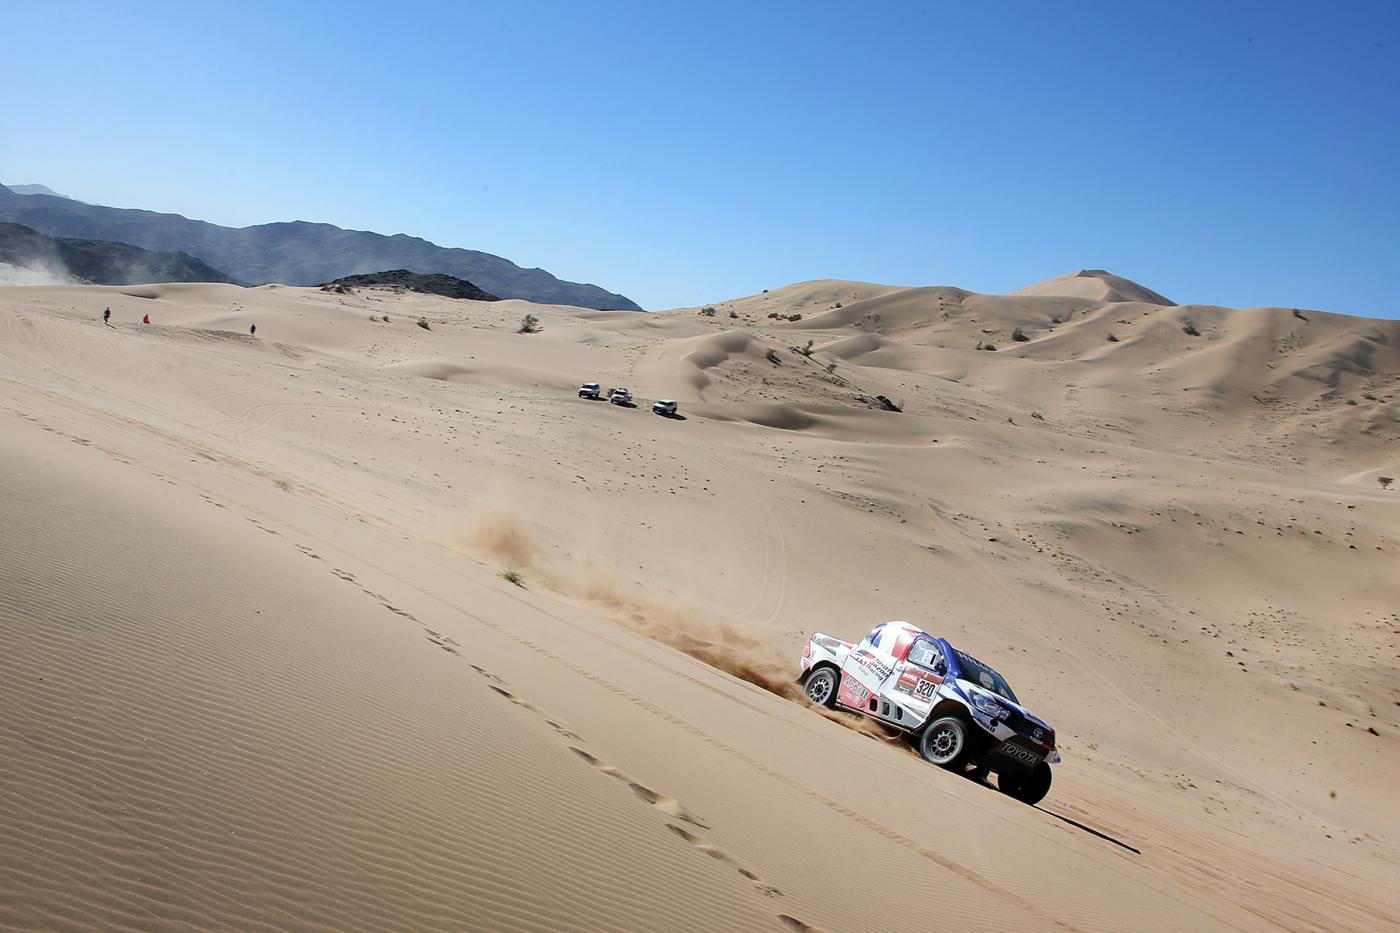 Dakar 2020 - Etape 1 - On est dans le bon wagon